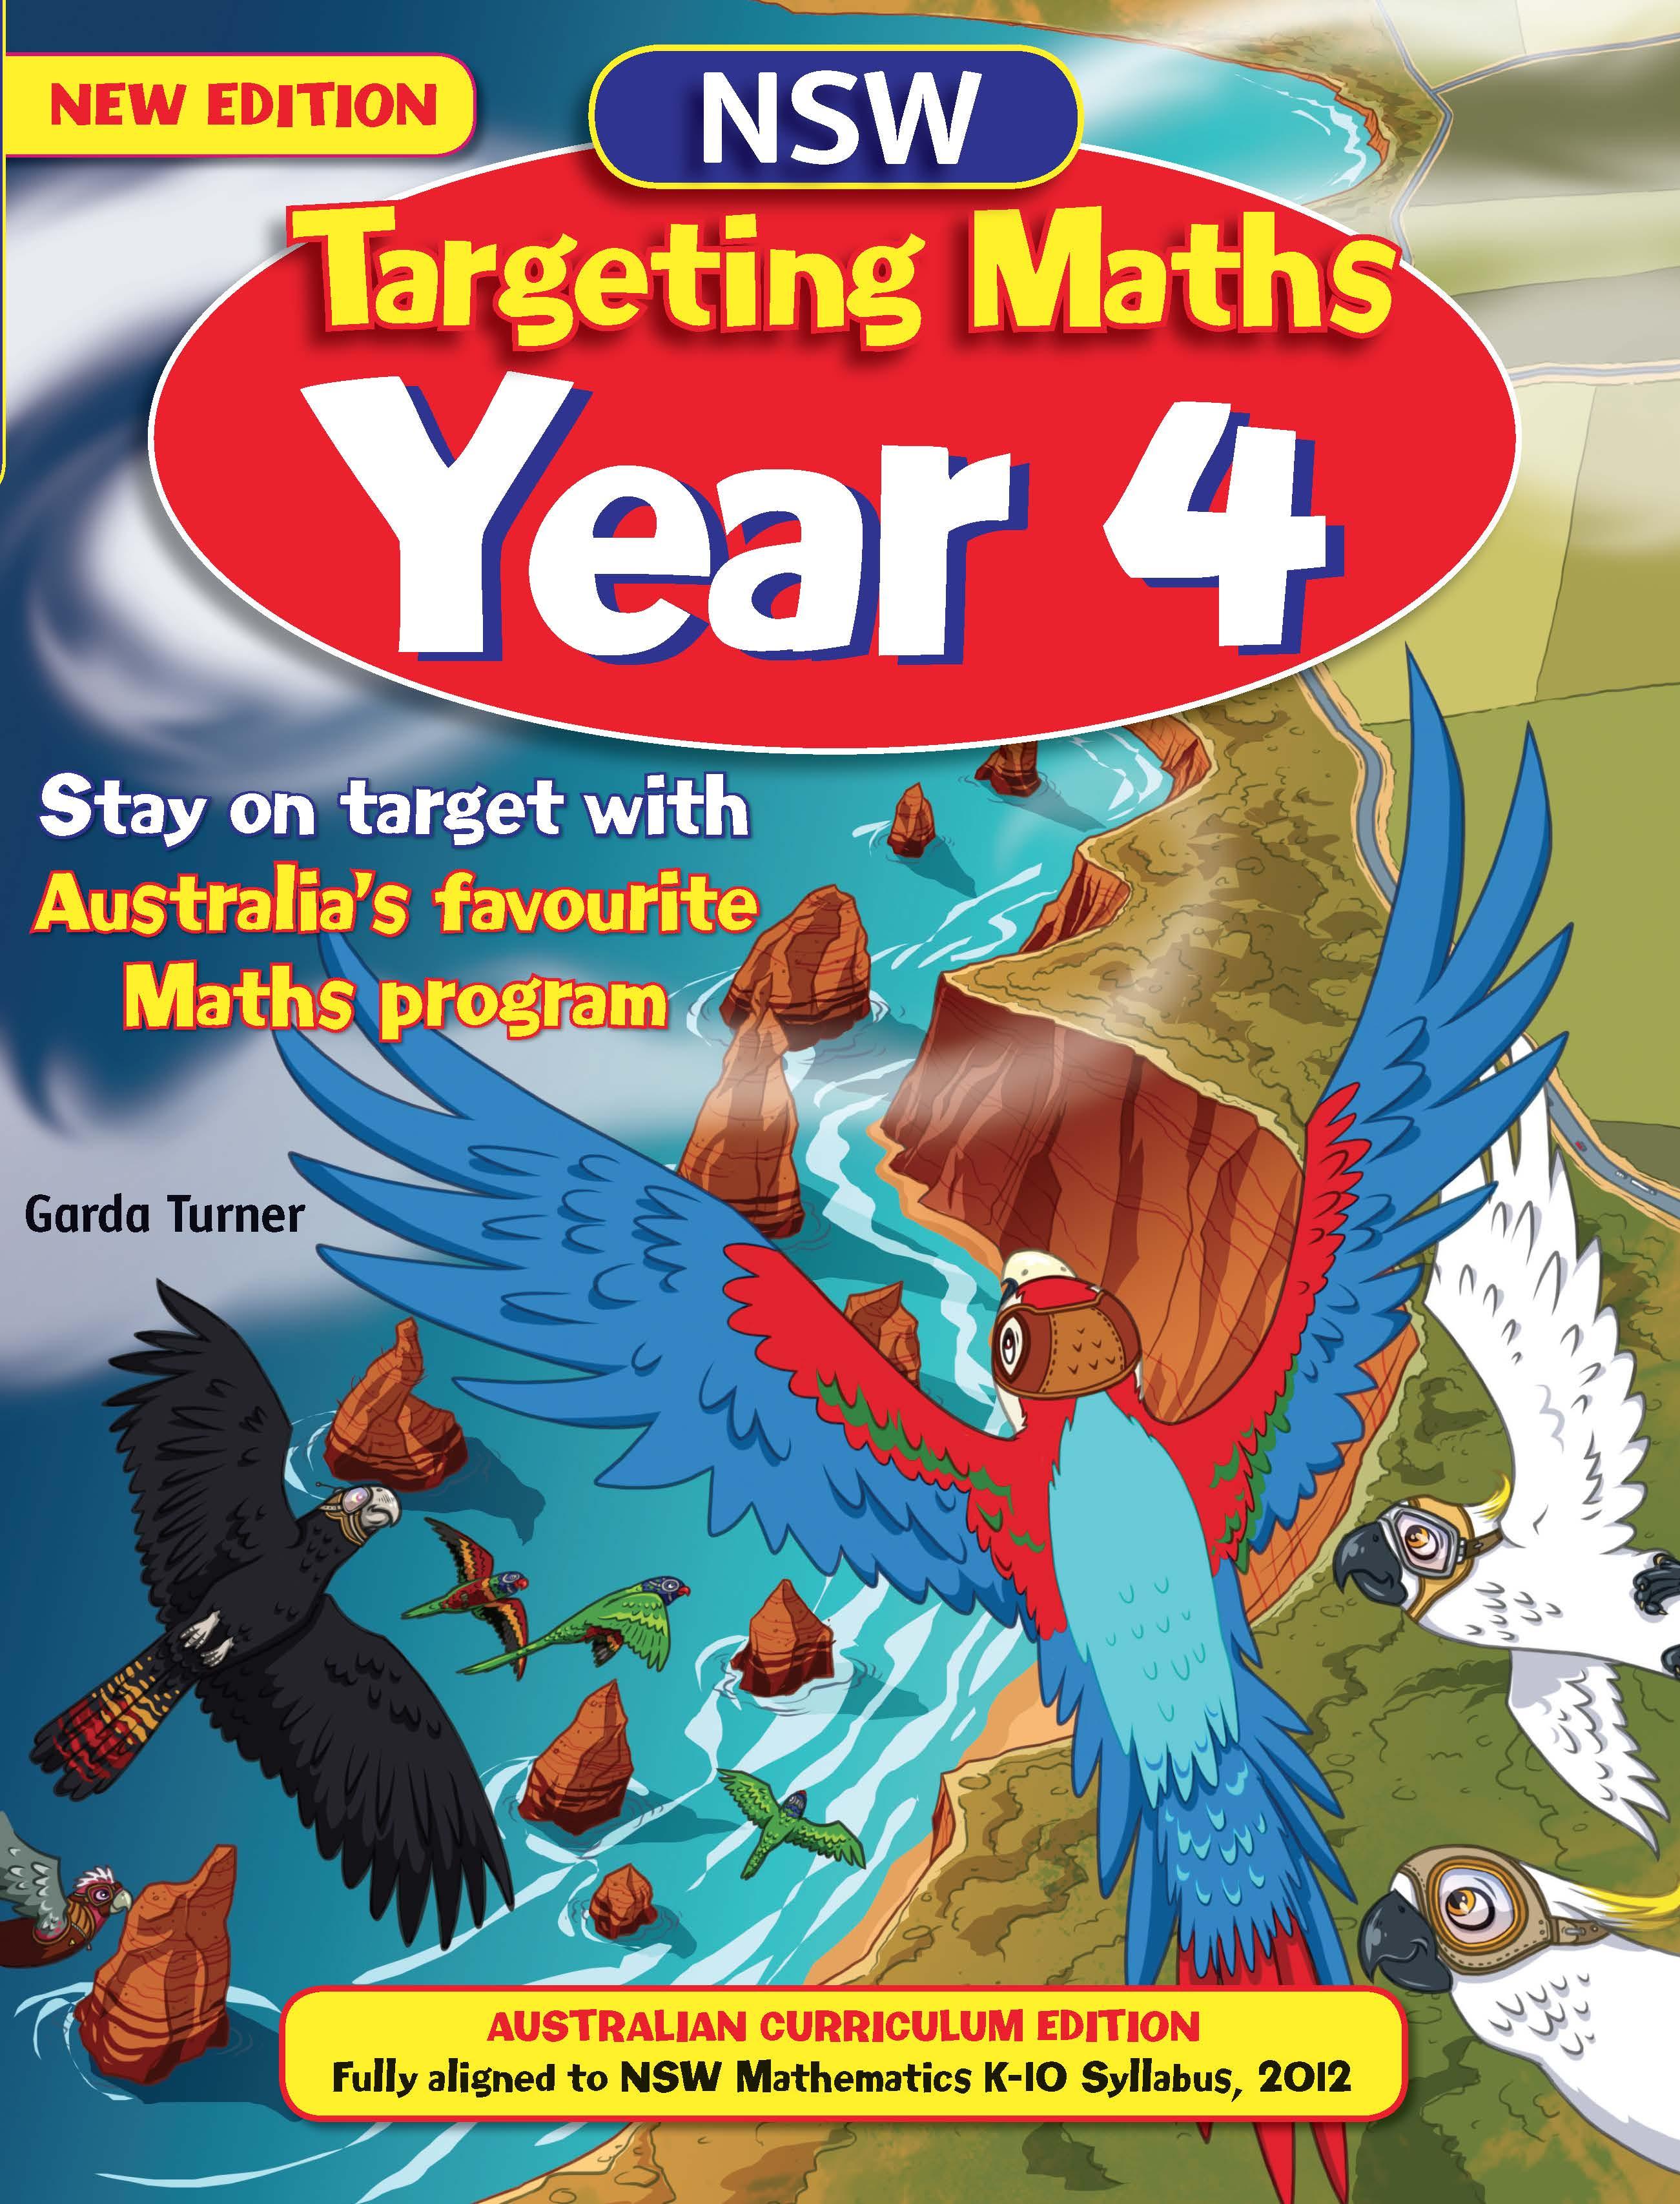 NSW Targeting Maths Australian Curriculum Edition Student Book Year 4